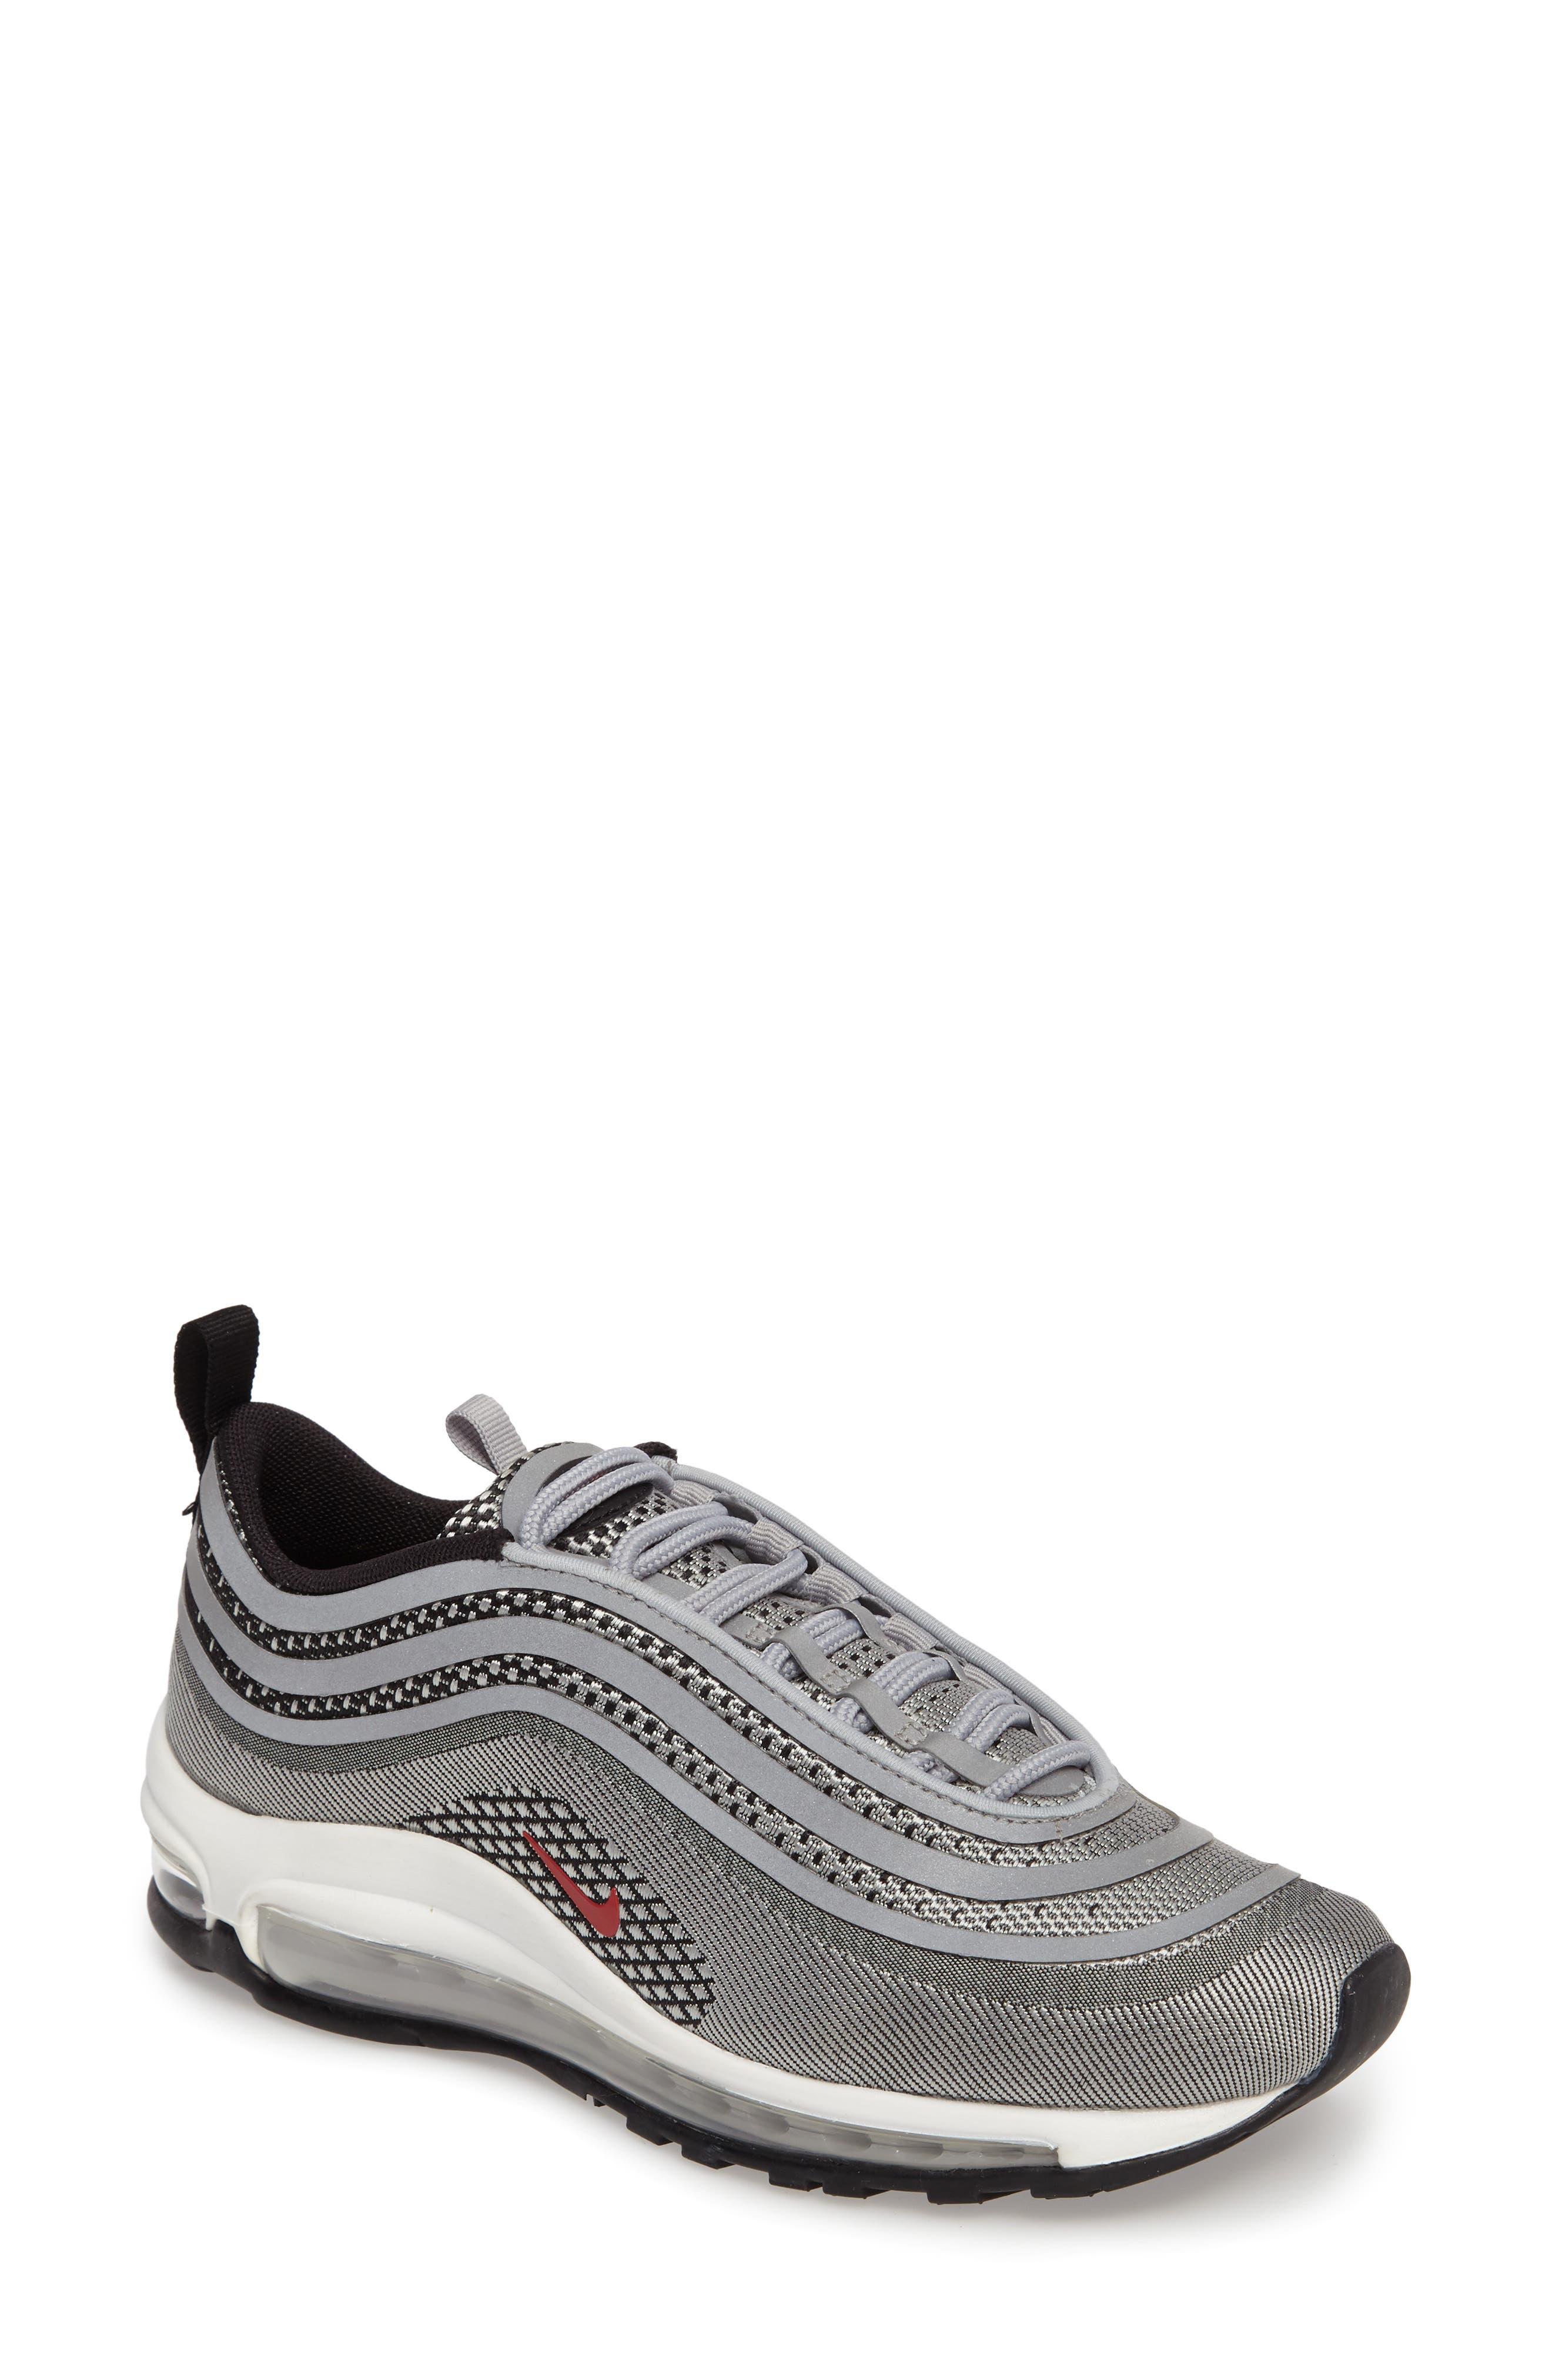 Air Max 97 Ultralight 2017 Sneaker,                             Main thumbnail 1, color,                             Metallic Silver/ Varsity Red